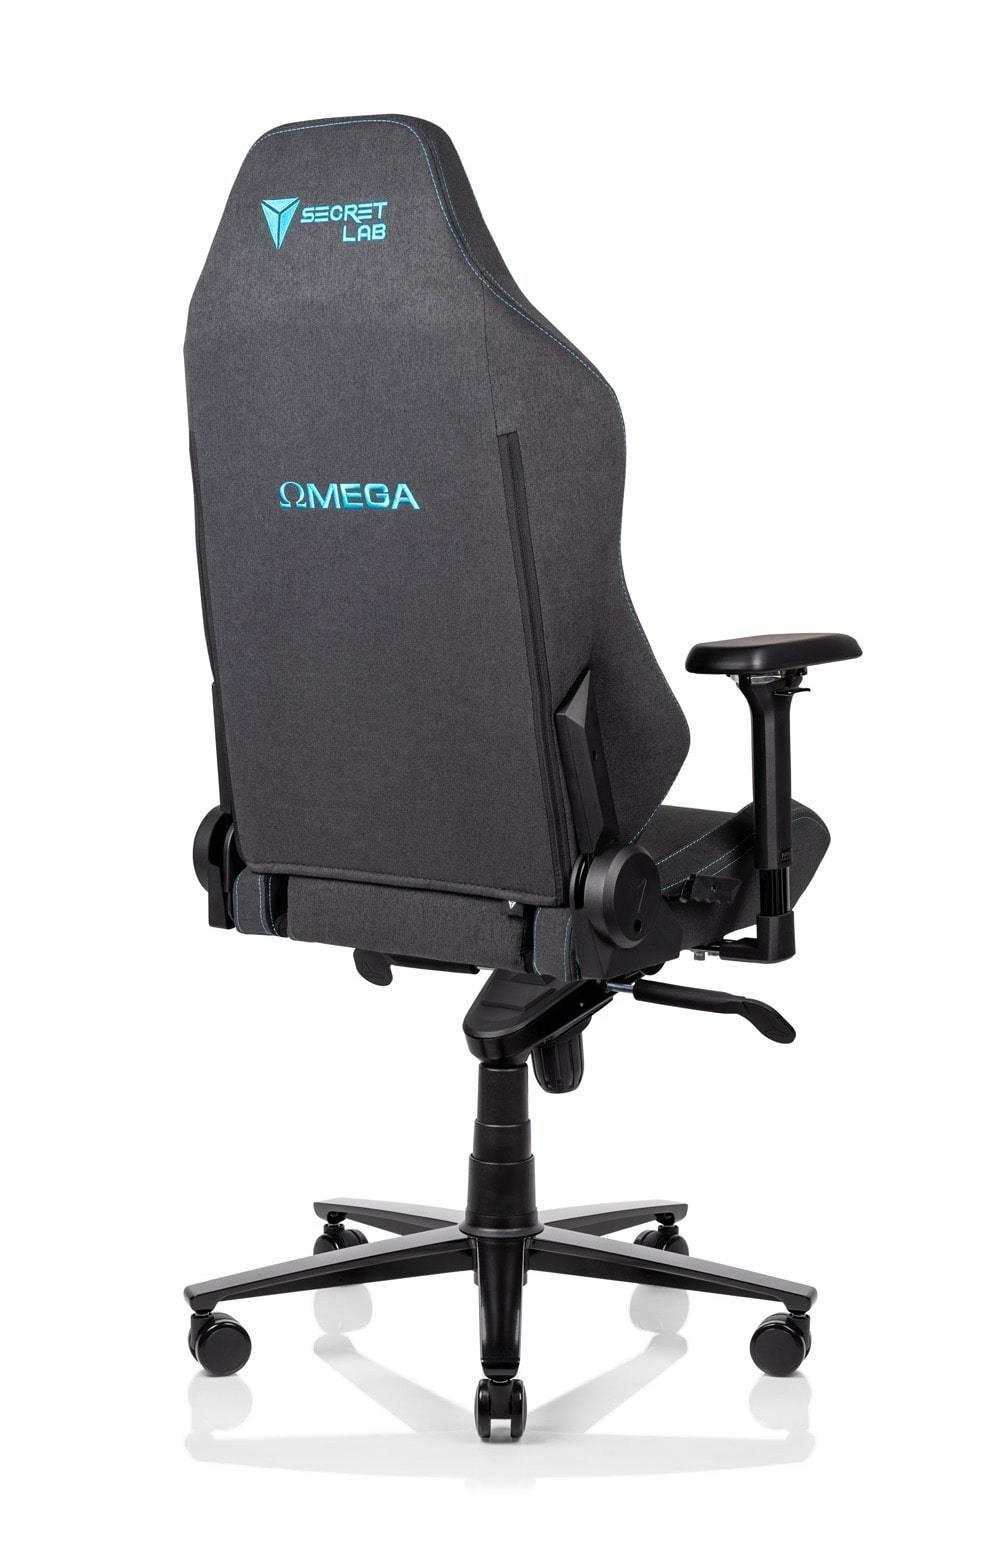 Secretlab-OMEGA-2020-So-Weave-Charcoal-Blue